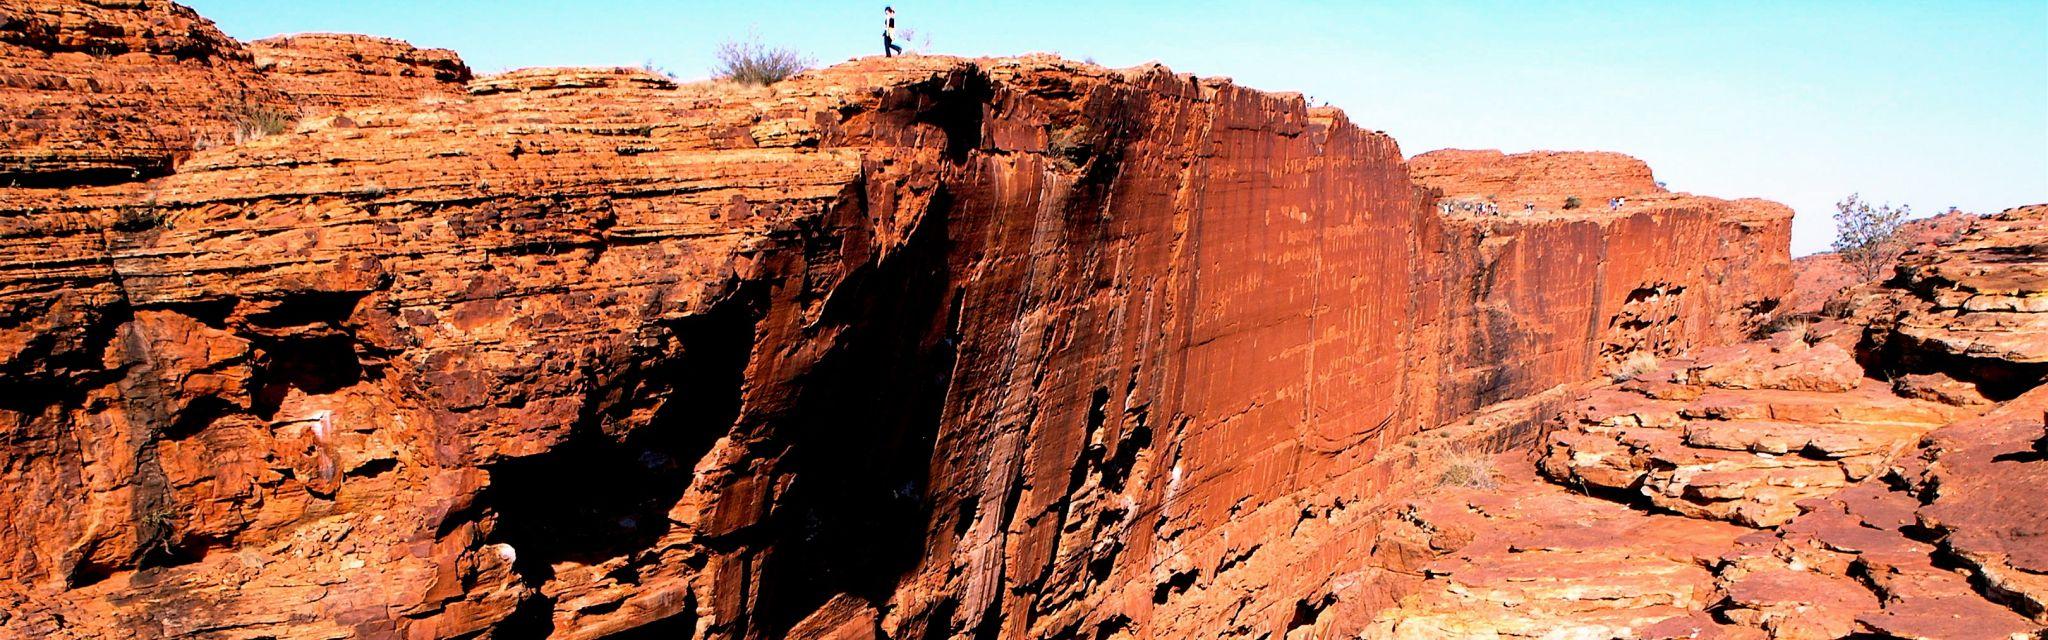 Sheer walls of Kings Canyon taken on Nature Bound Australia Red Centre Tour